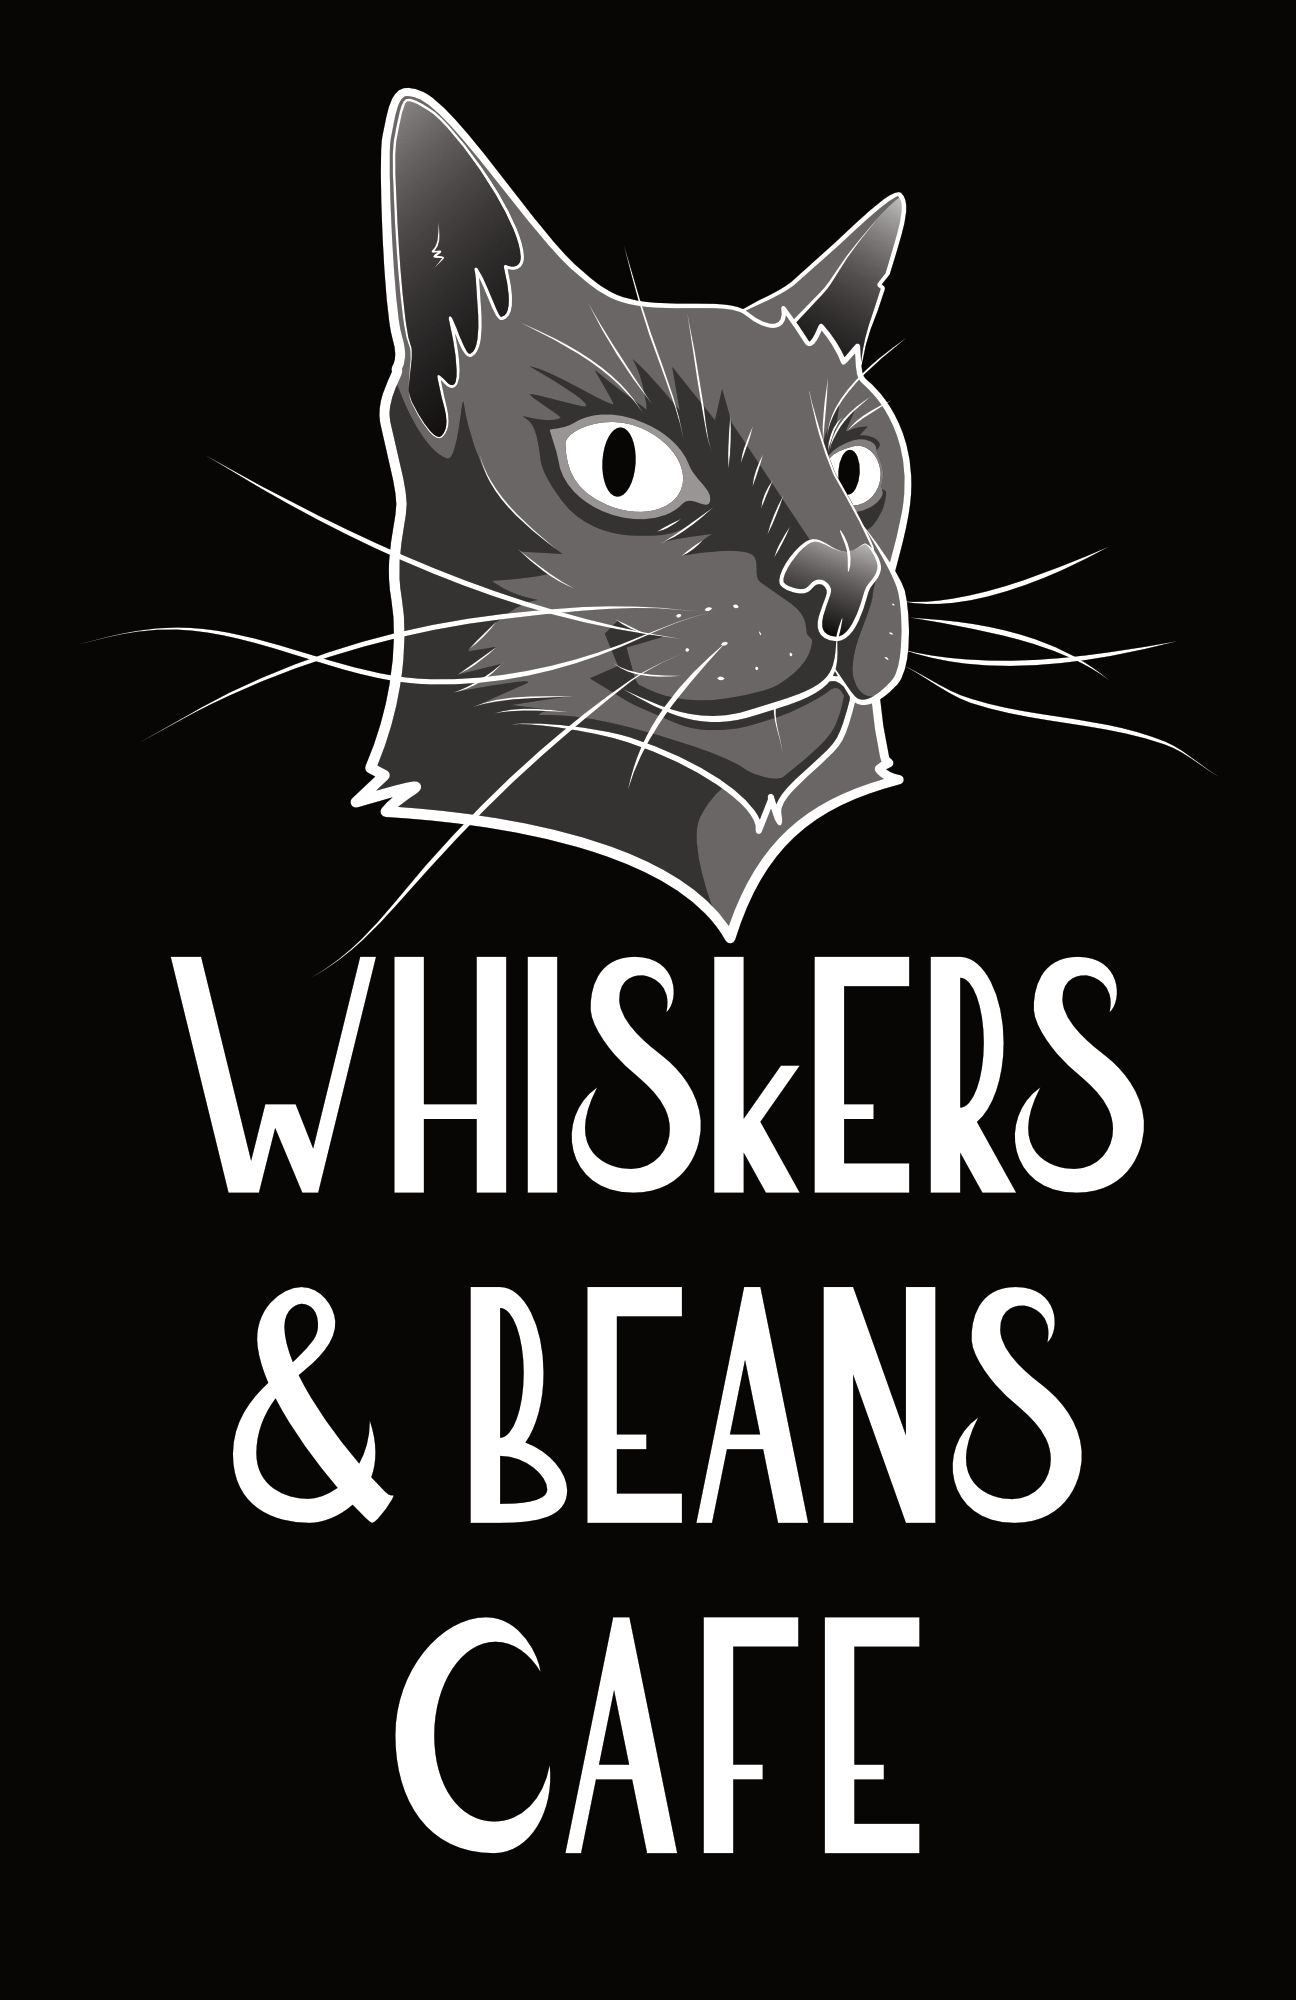 Whiskers & Beans Cafe Logo - black